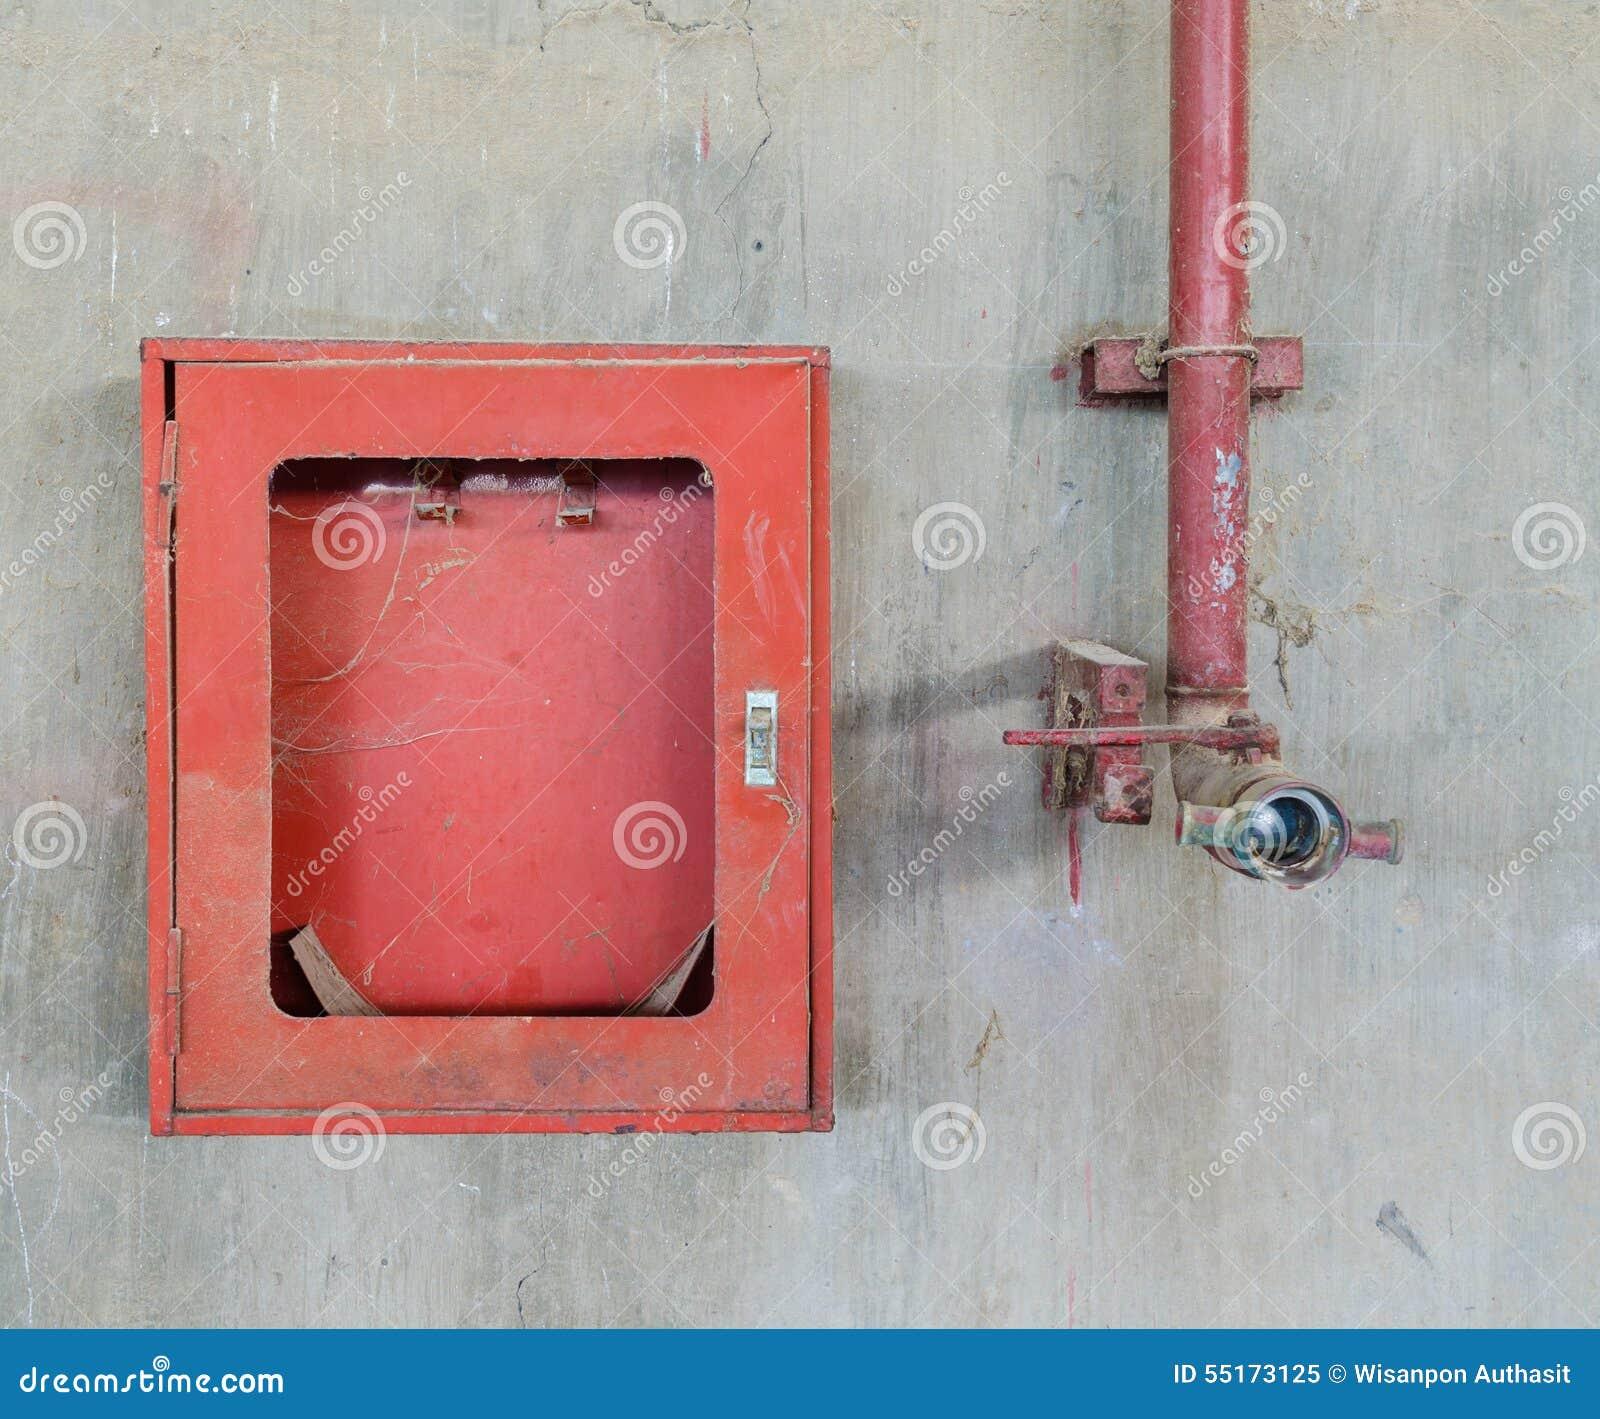 Старые firehose и коробка firehose